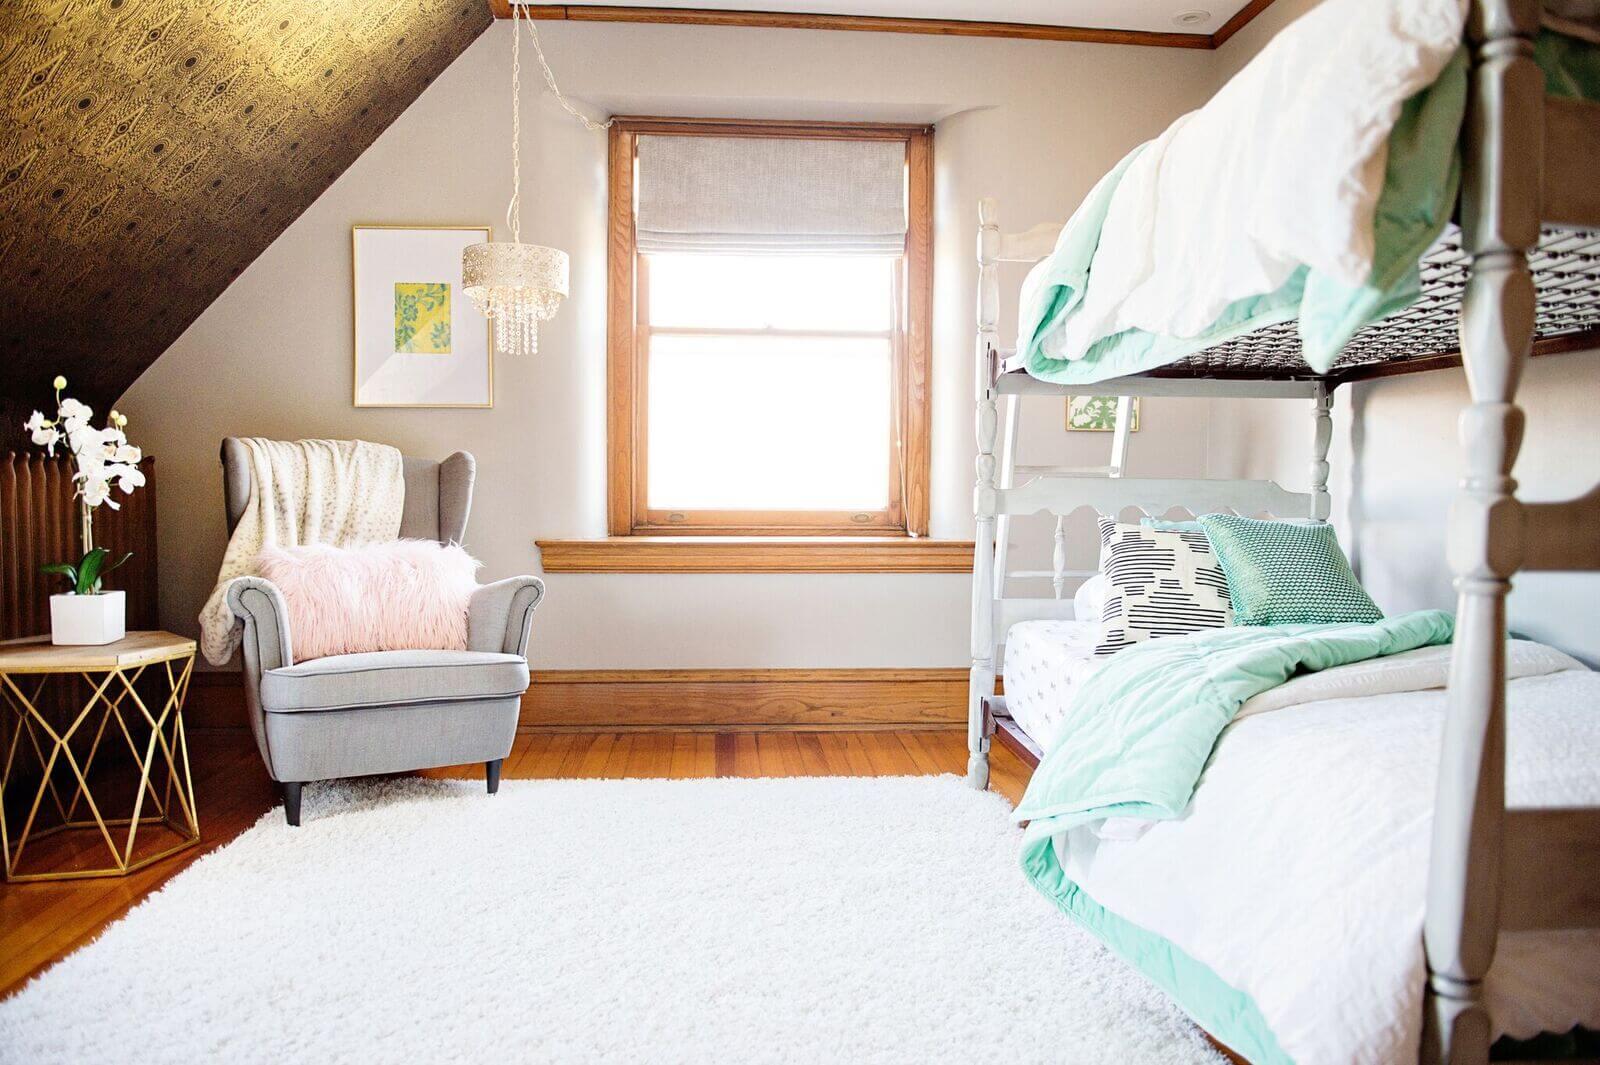 interior-design-bedroom-decor-kids-guest-room-elegant-philadelphia-pa-4.jpeg